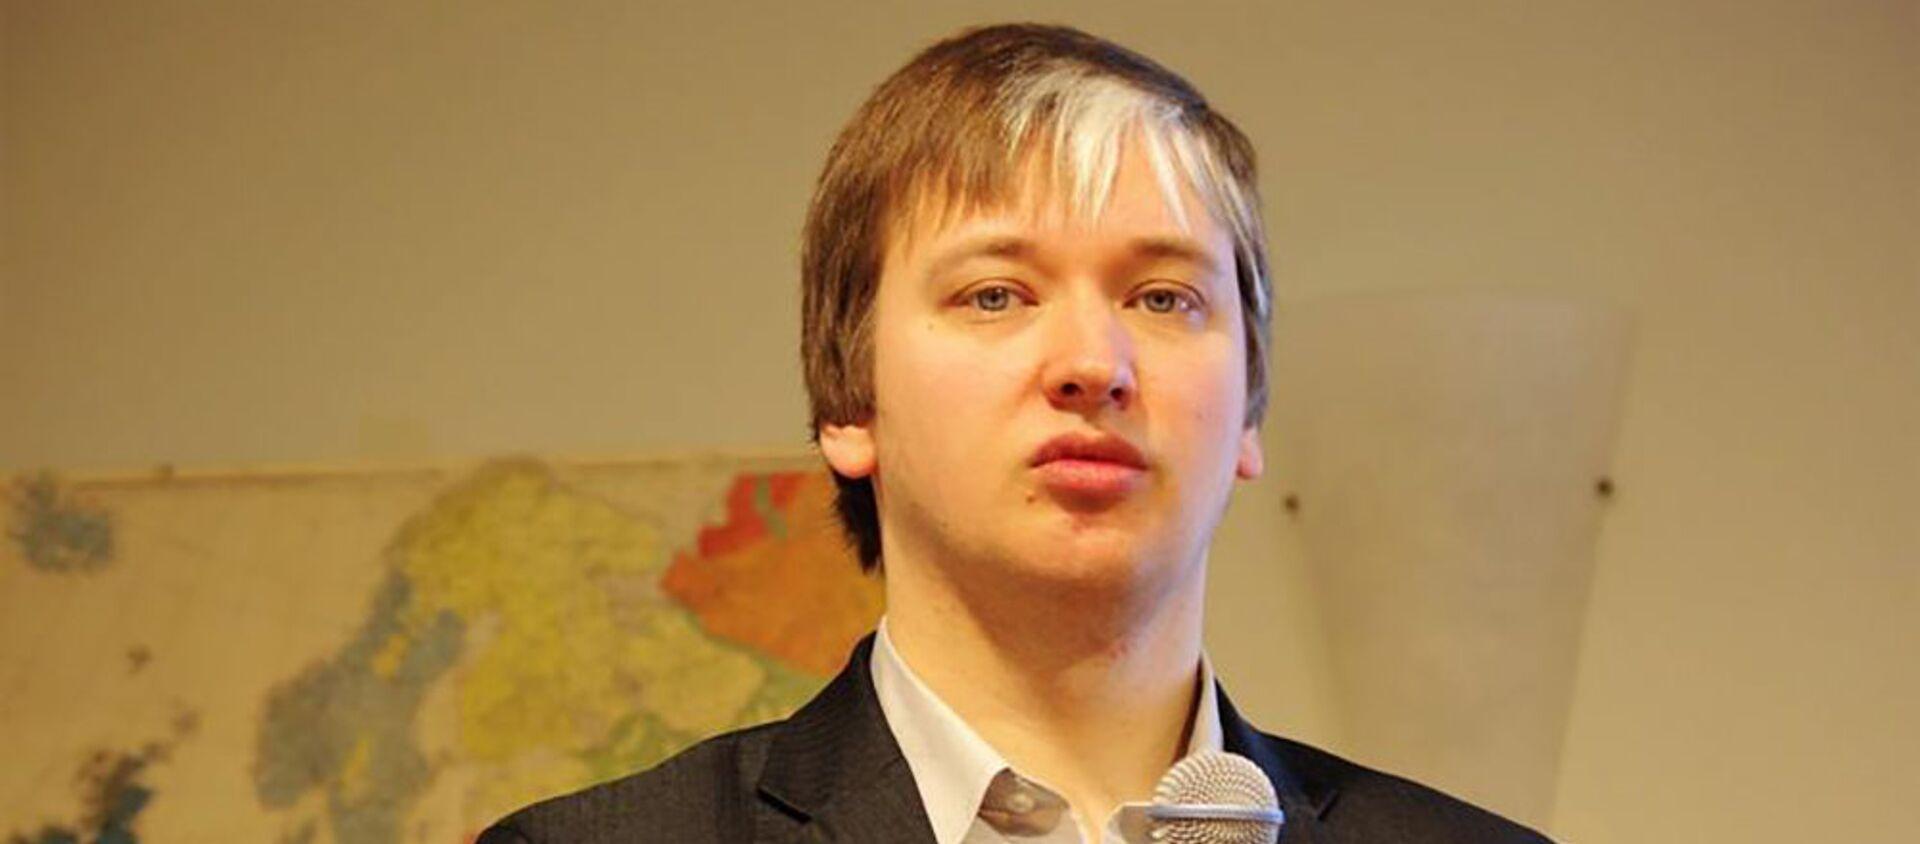 Александр Кузьмин - Sputnik Латвия, 1920, 04.03.2021